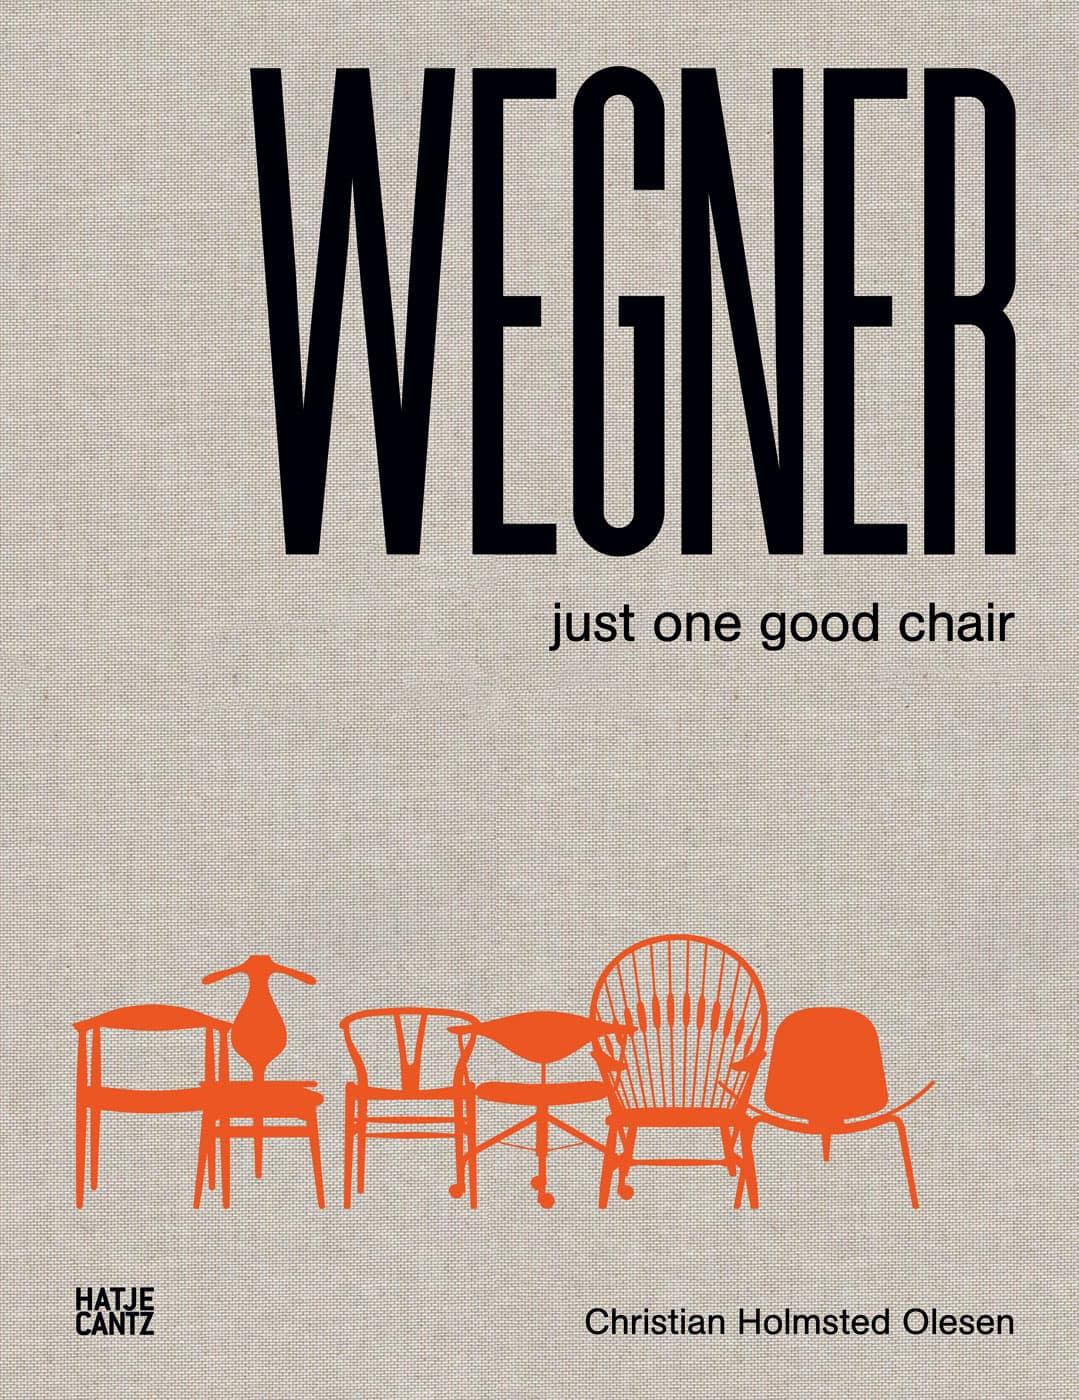 Just One Good Chair, Hans J. Wegner, Hatje Cantz